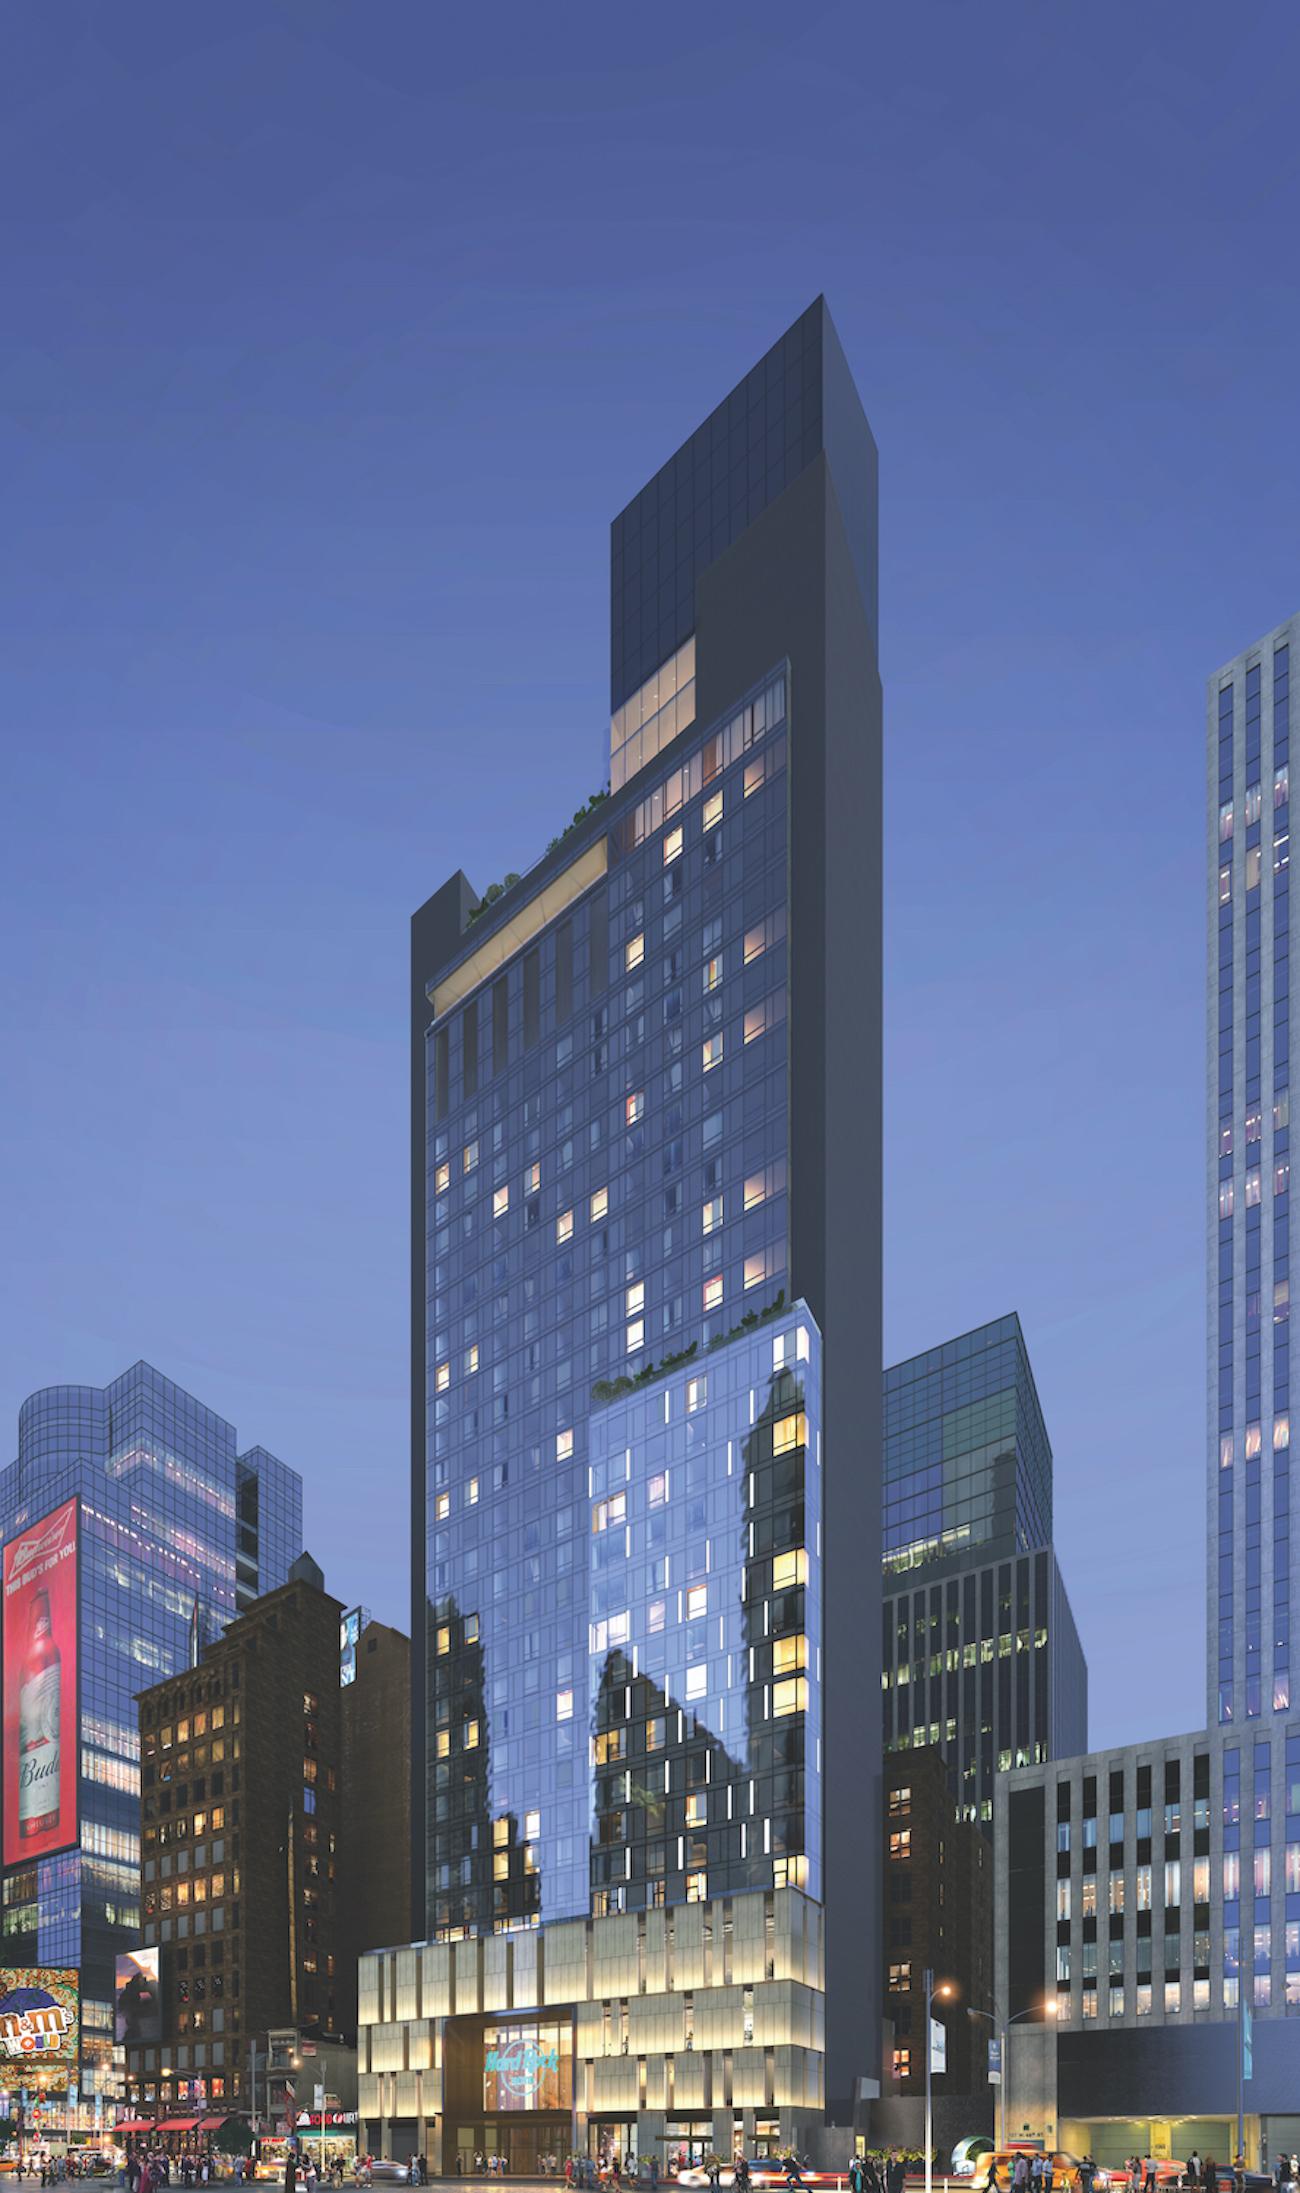 newyorkyimby.com